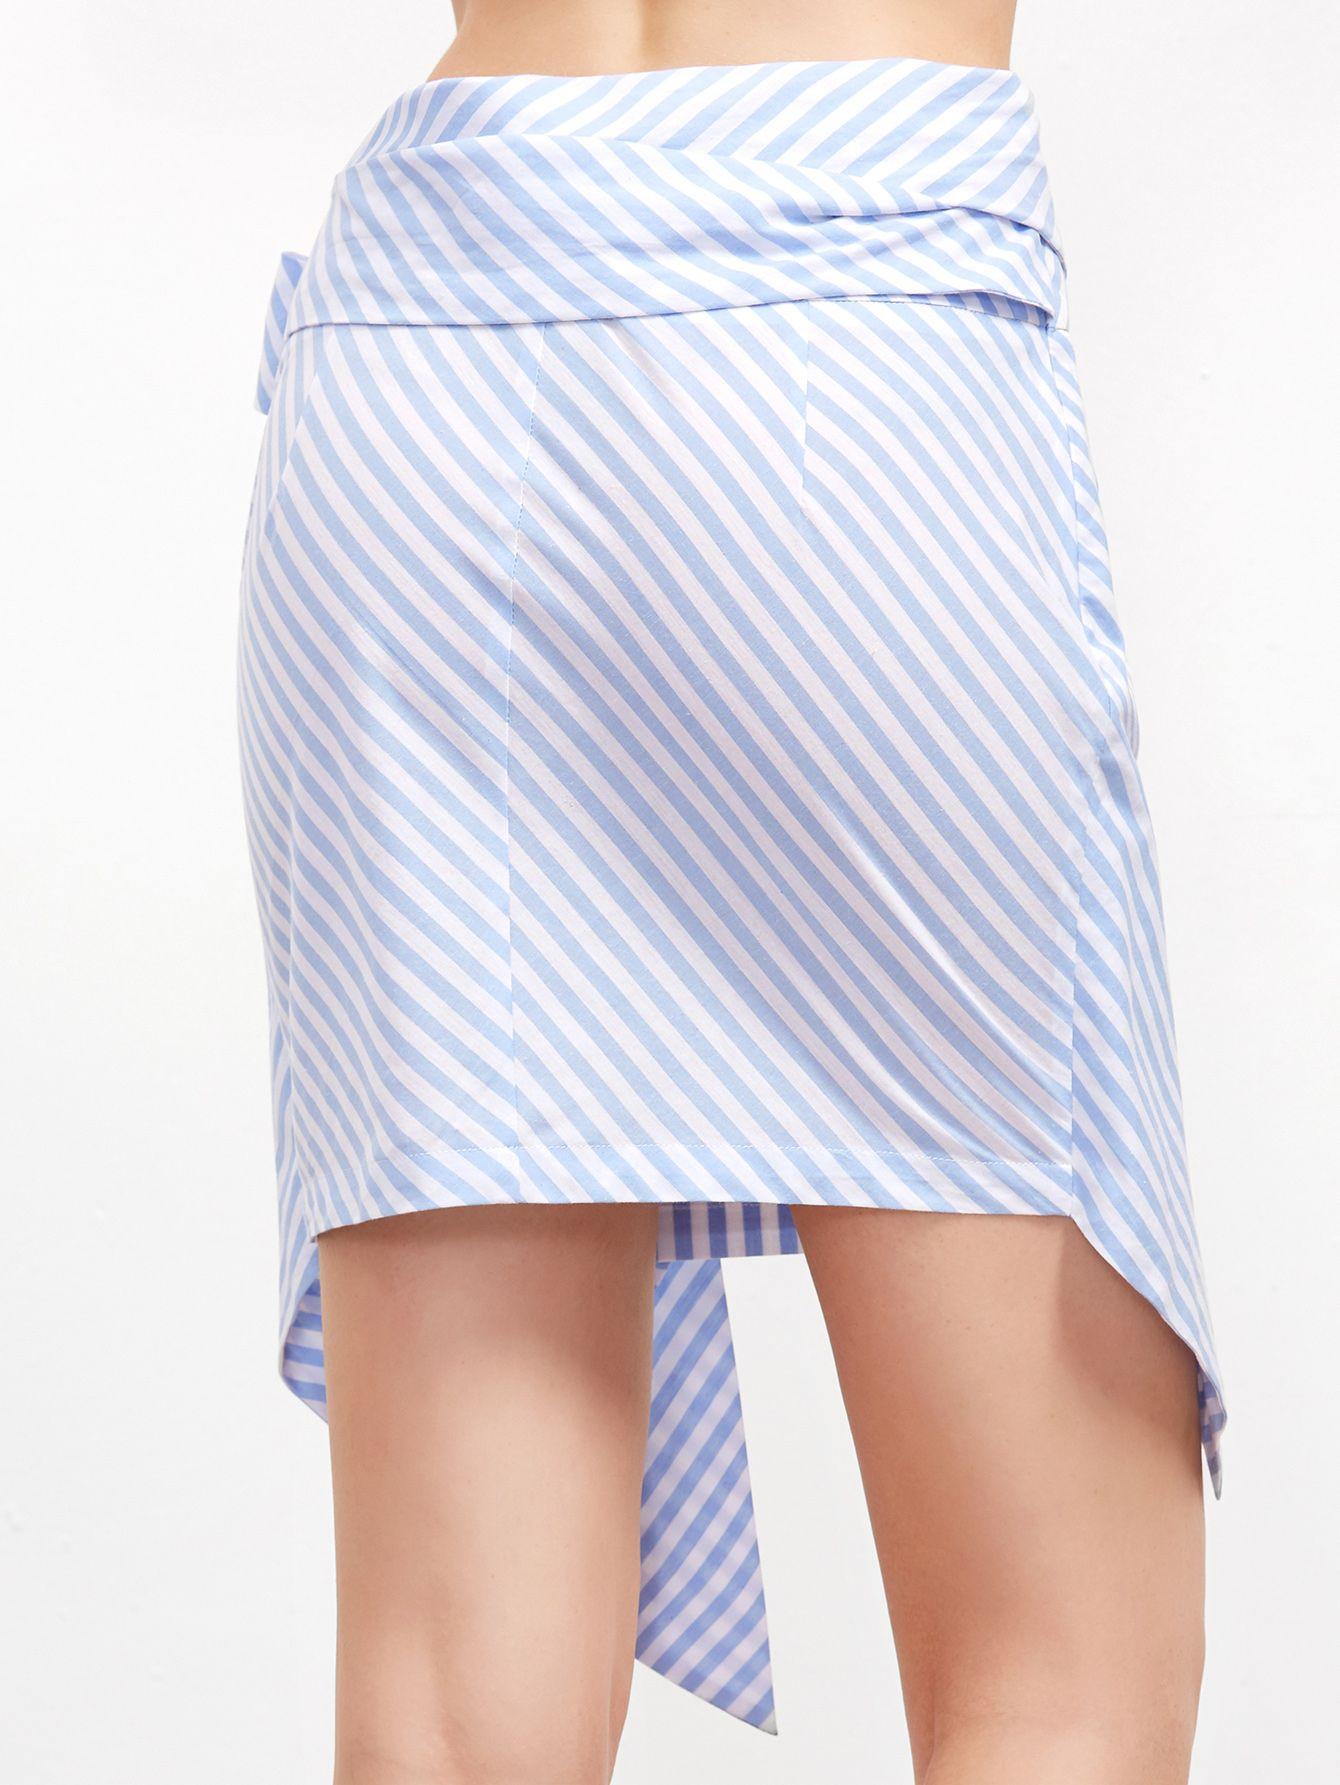 533347bb2 skirt161014701_2   clothes to do   Pinterest   Falda asimétrica ...